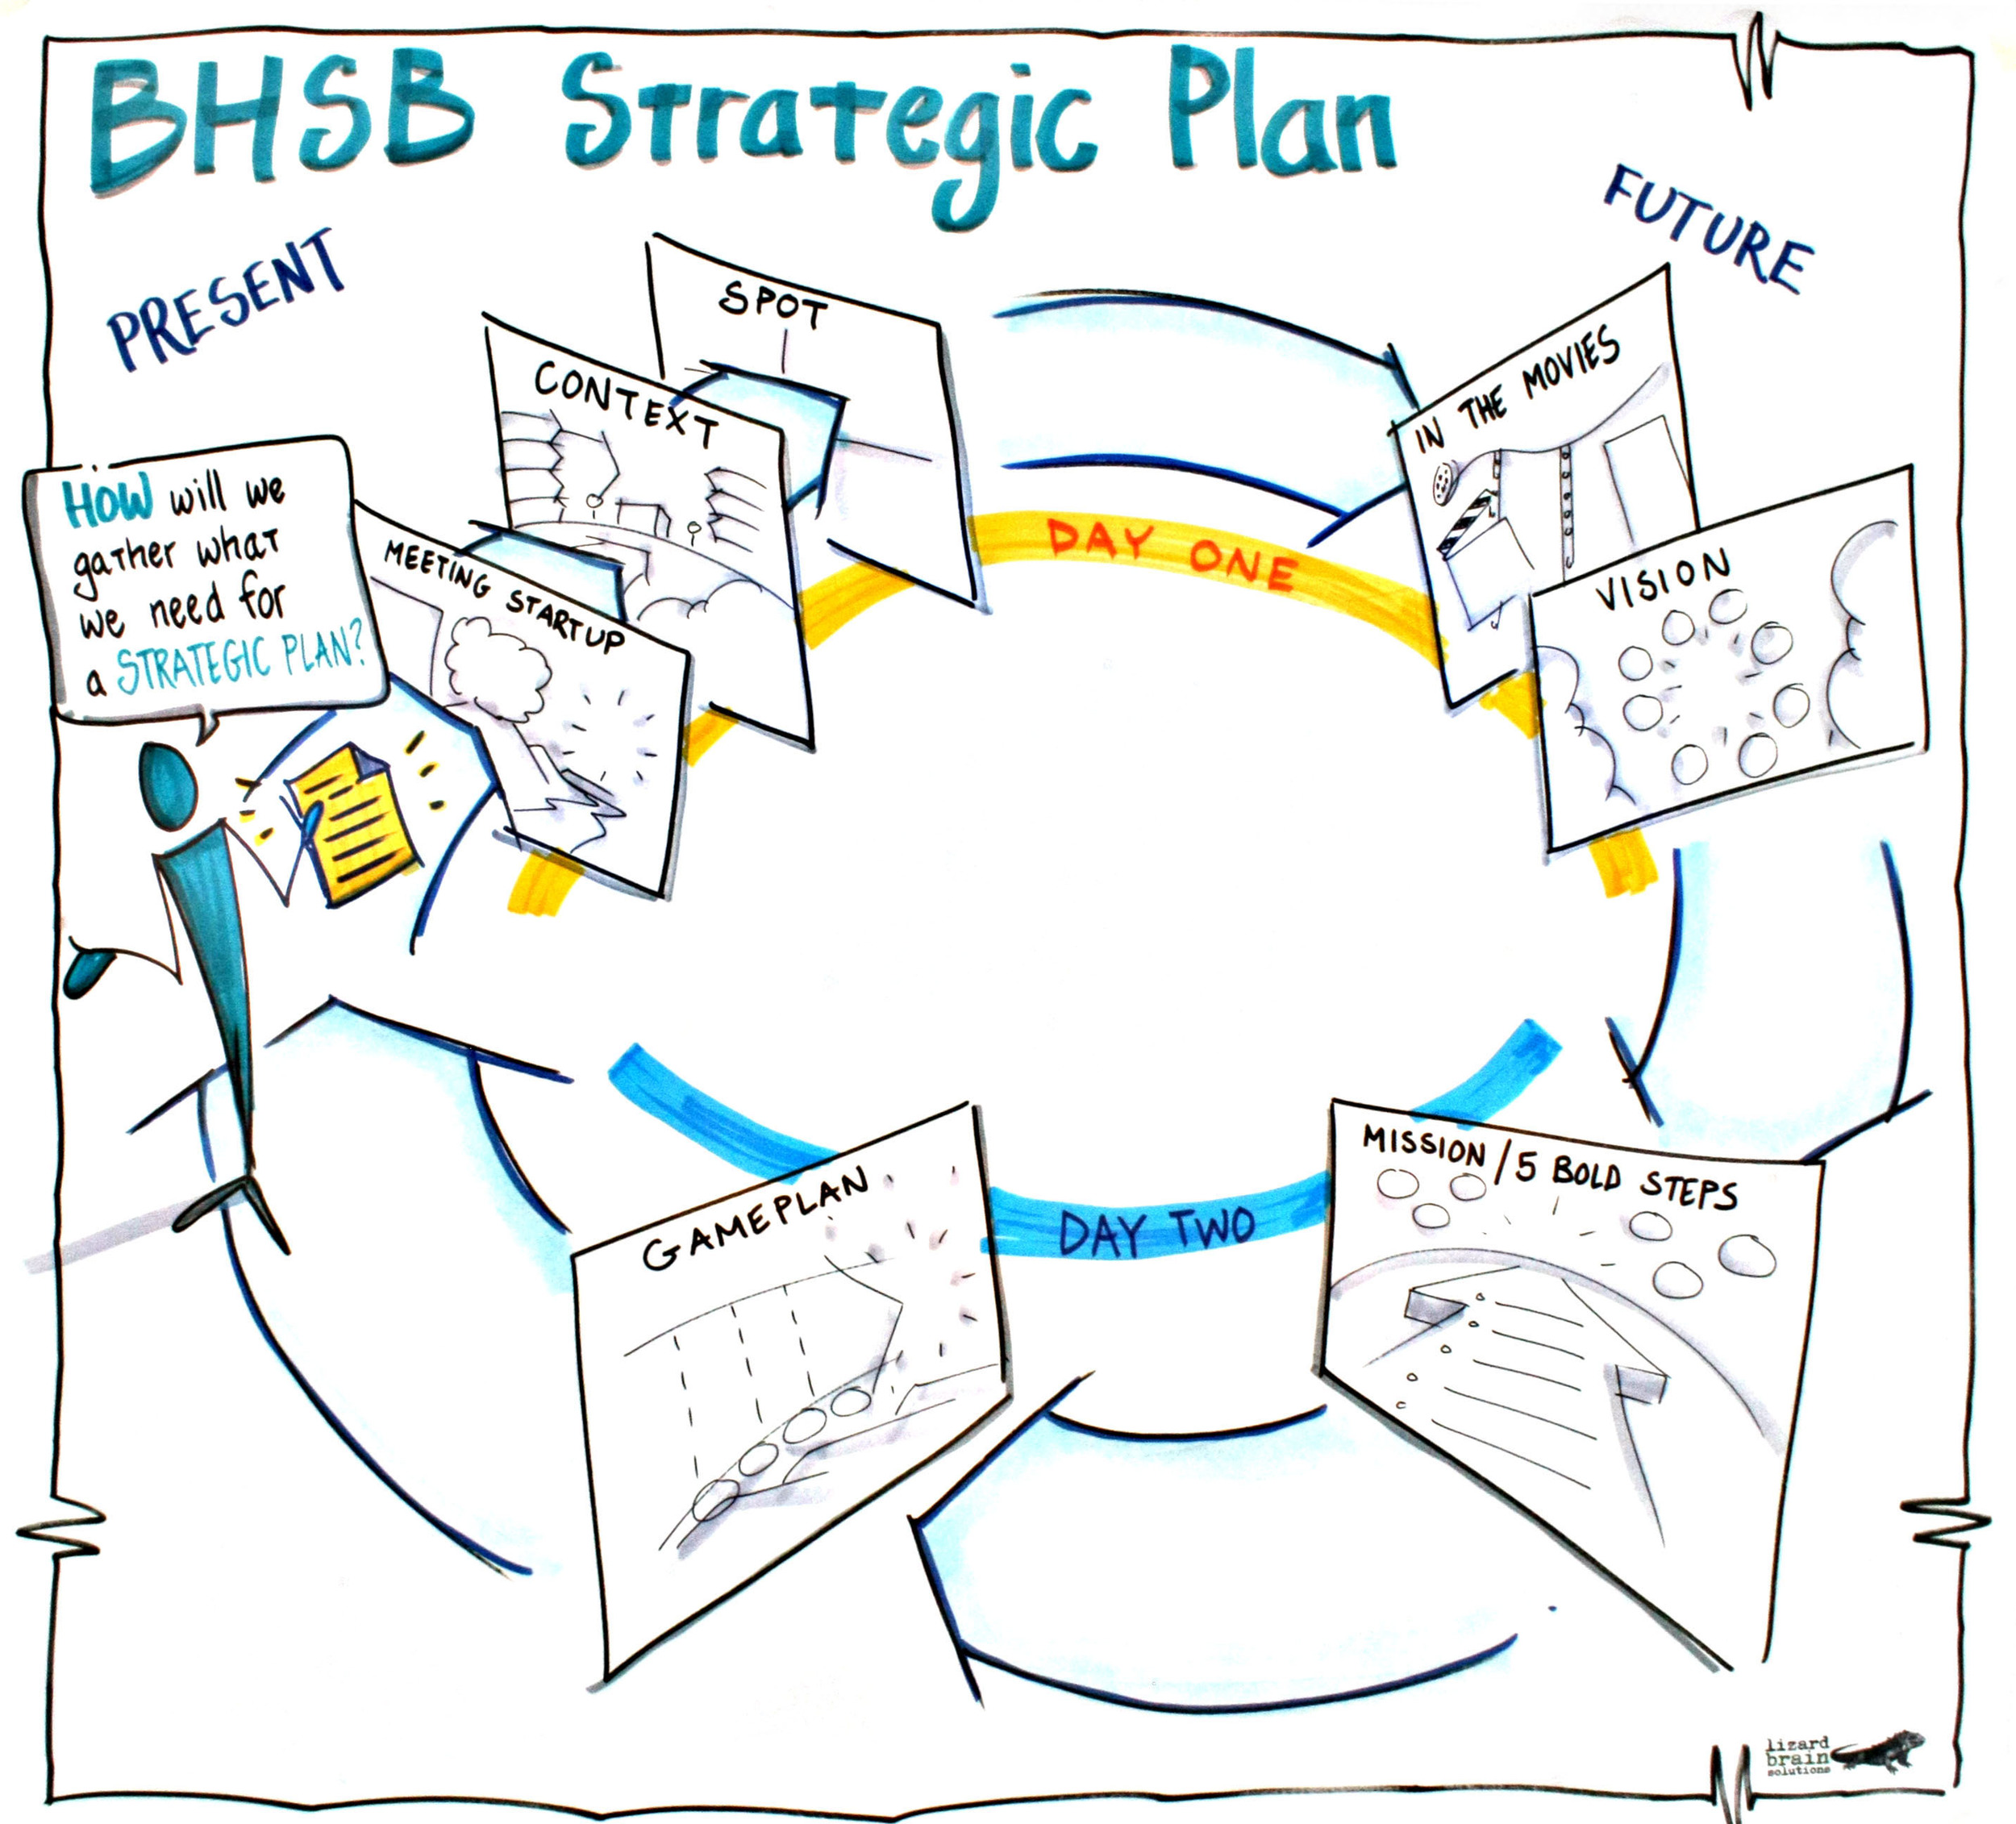 BHSB Approach.jpg